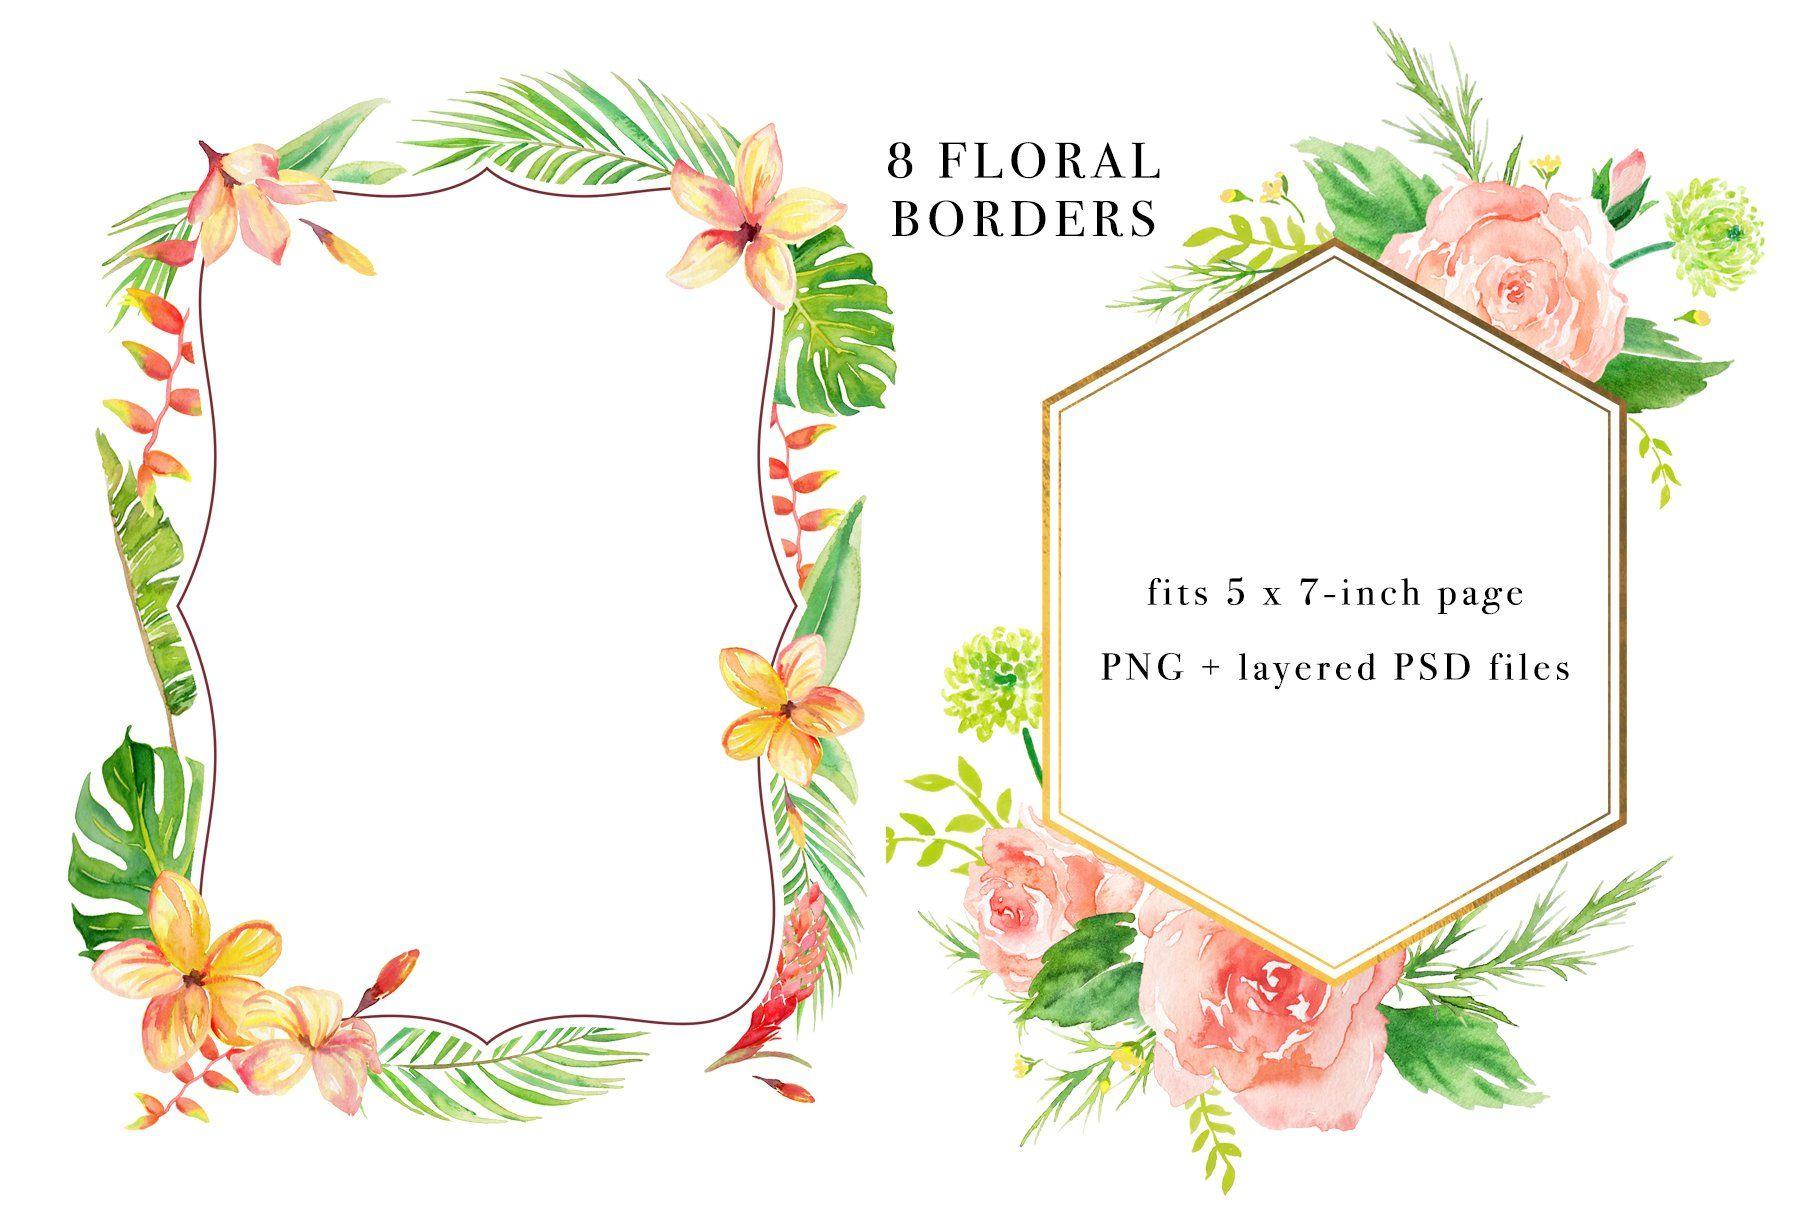 Floral borders watercolor design set floral border